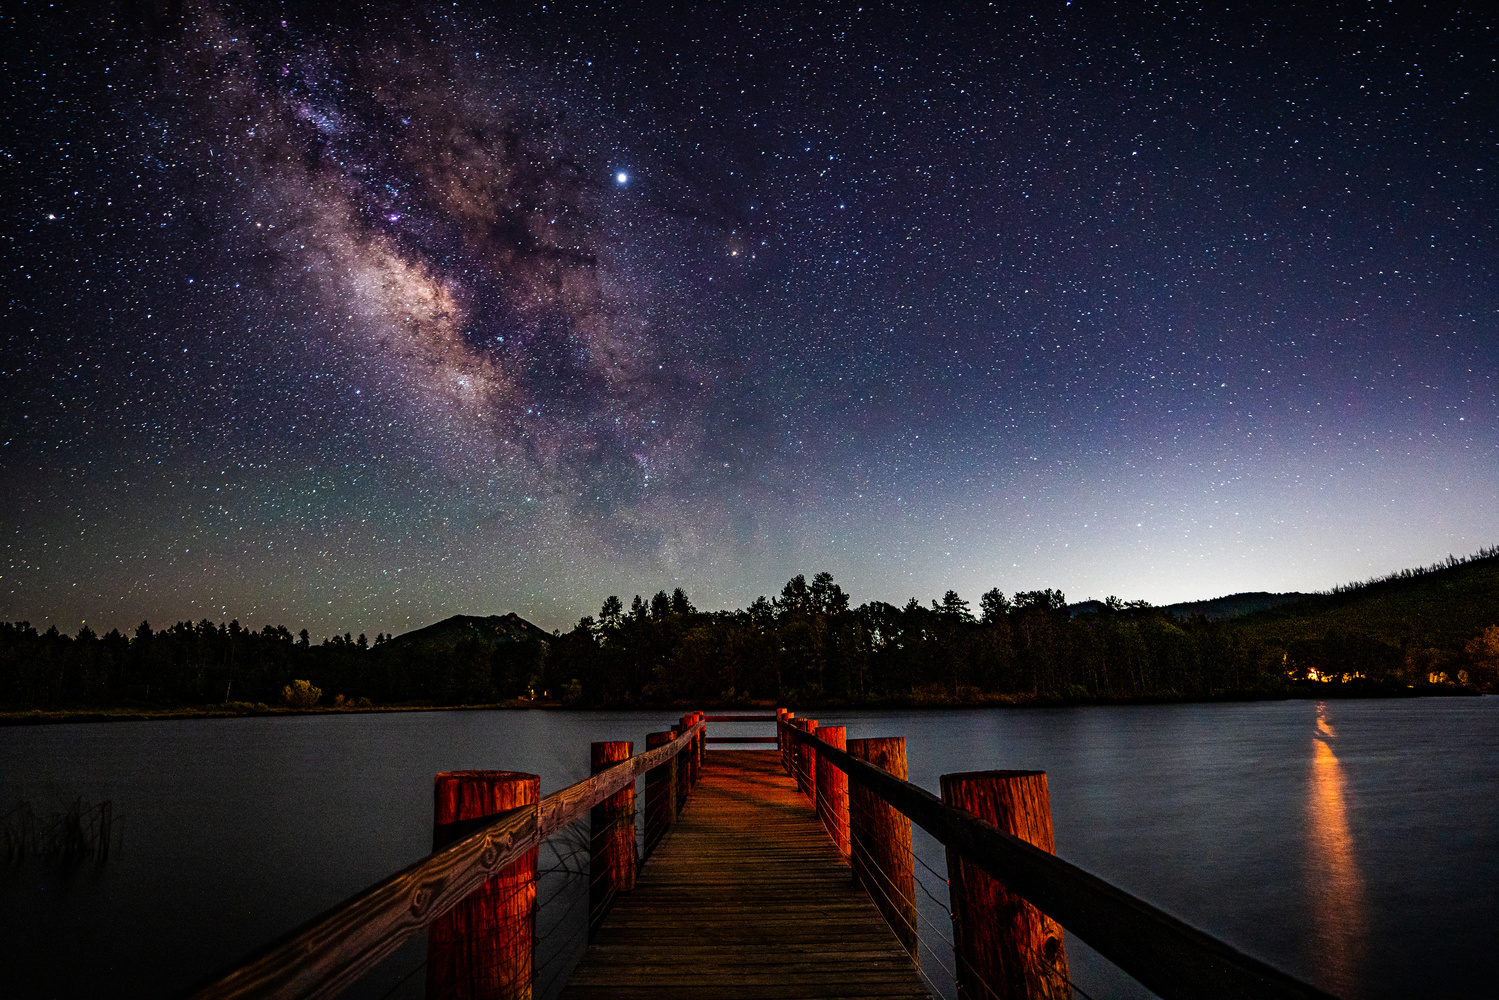 Milky Way, Lake Cuyamaca near Julian, California by Ryan Fulkerson